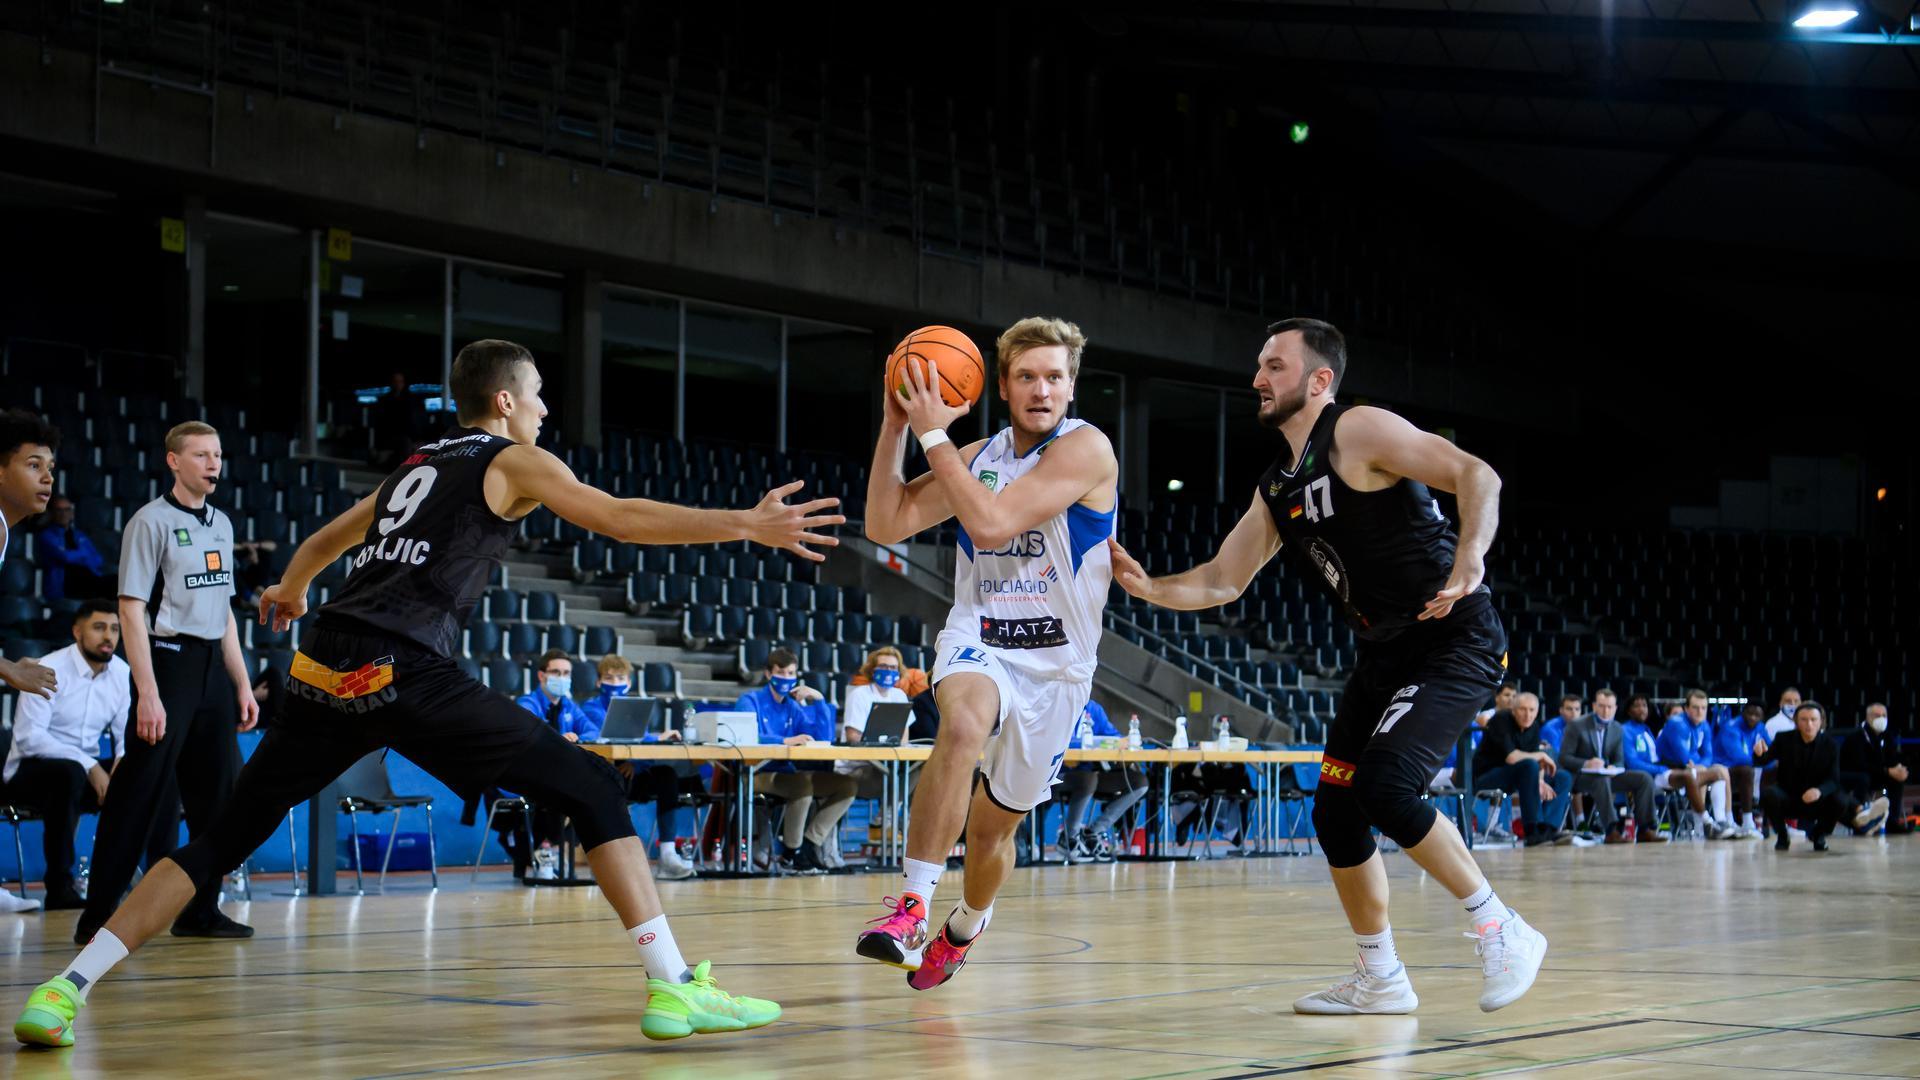 Aleksa Bulajic (Kirchheim), Antonio Pilipovic (Lions) im Zweikampf mit Andreas Kronhardt (Kirchheim) (von links).  GES/ Basketball/ ProA: PSK Lions - VfL Kirchheim Knights, 14.11.2020 --